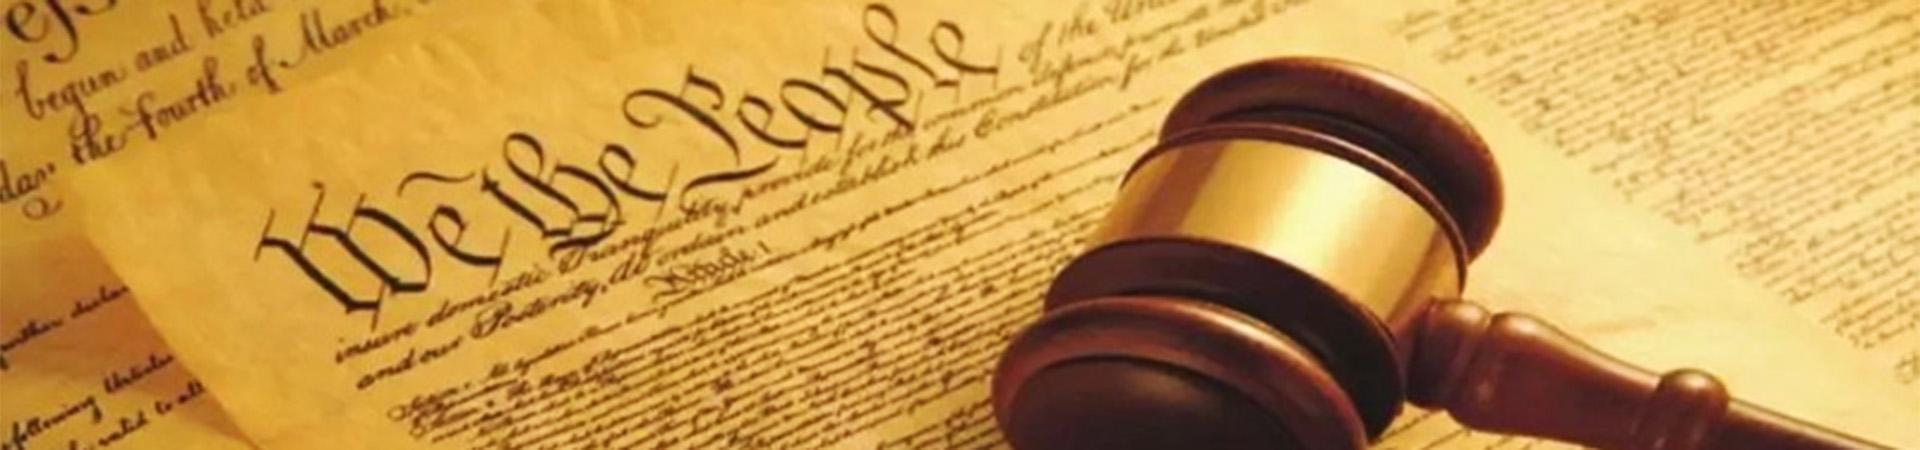 ACAOSA CONSTITUTION